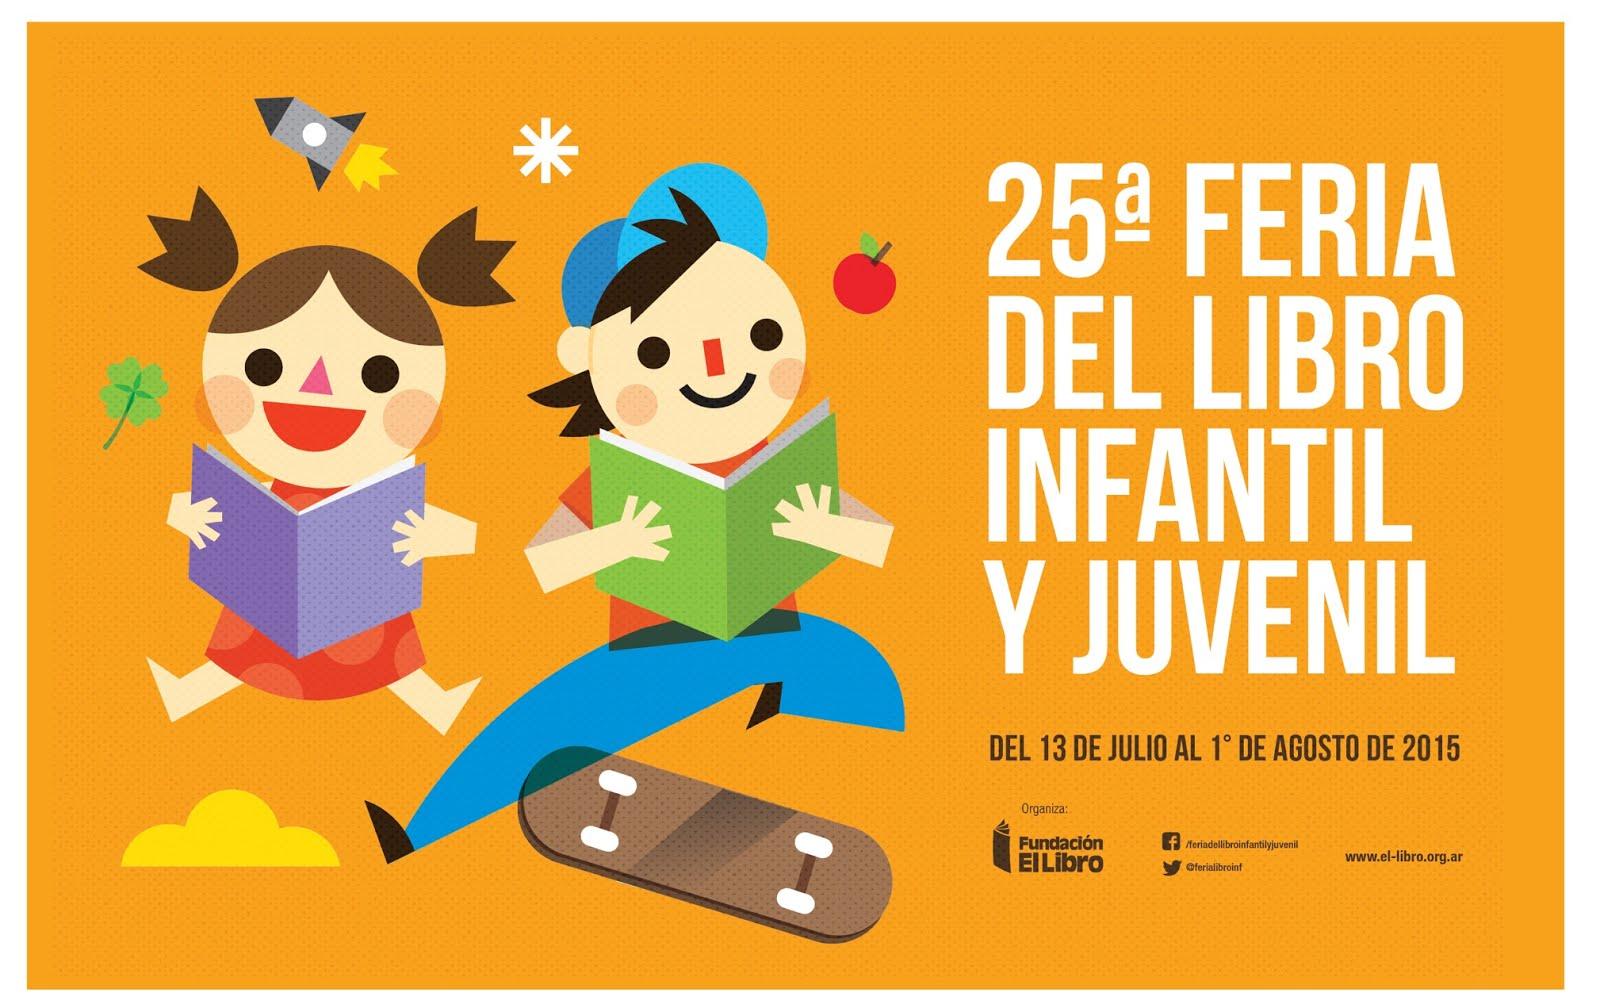 25 Feria del libro Infantil y Juvenil.